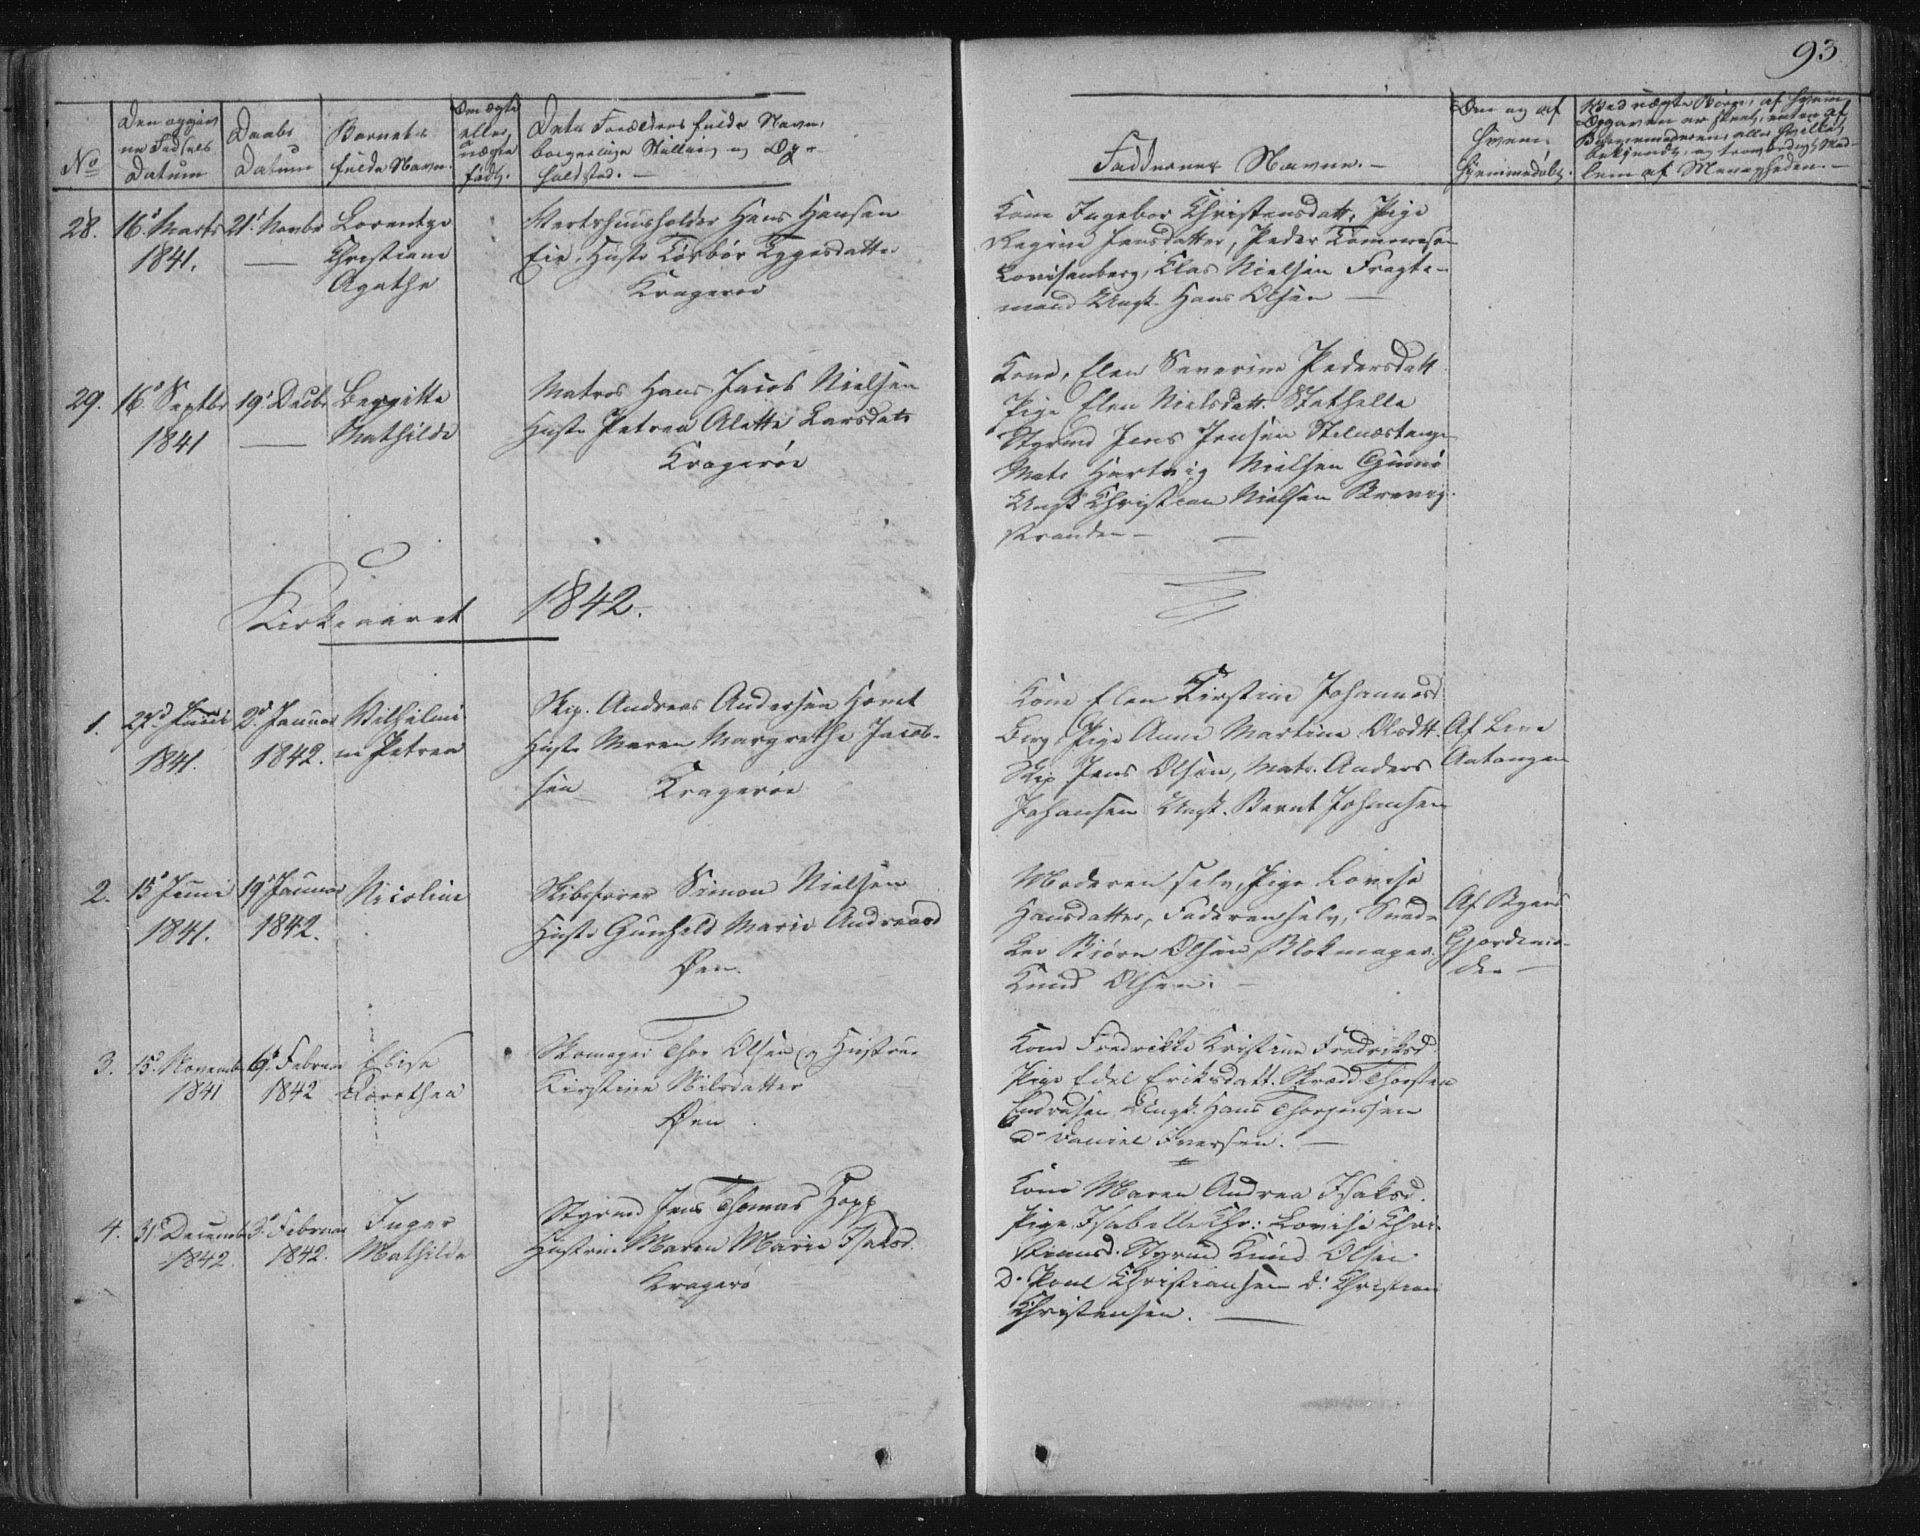 SAKO, Kragerø kirkebøker, F/Fa/L0005: Ministerialbok nr. 5, 1832-1847, s. 93